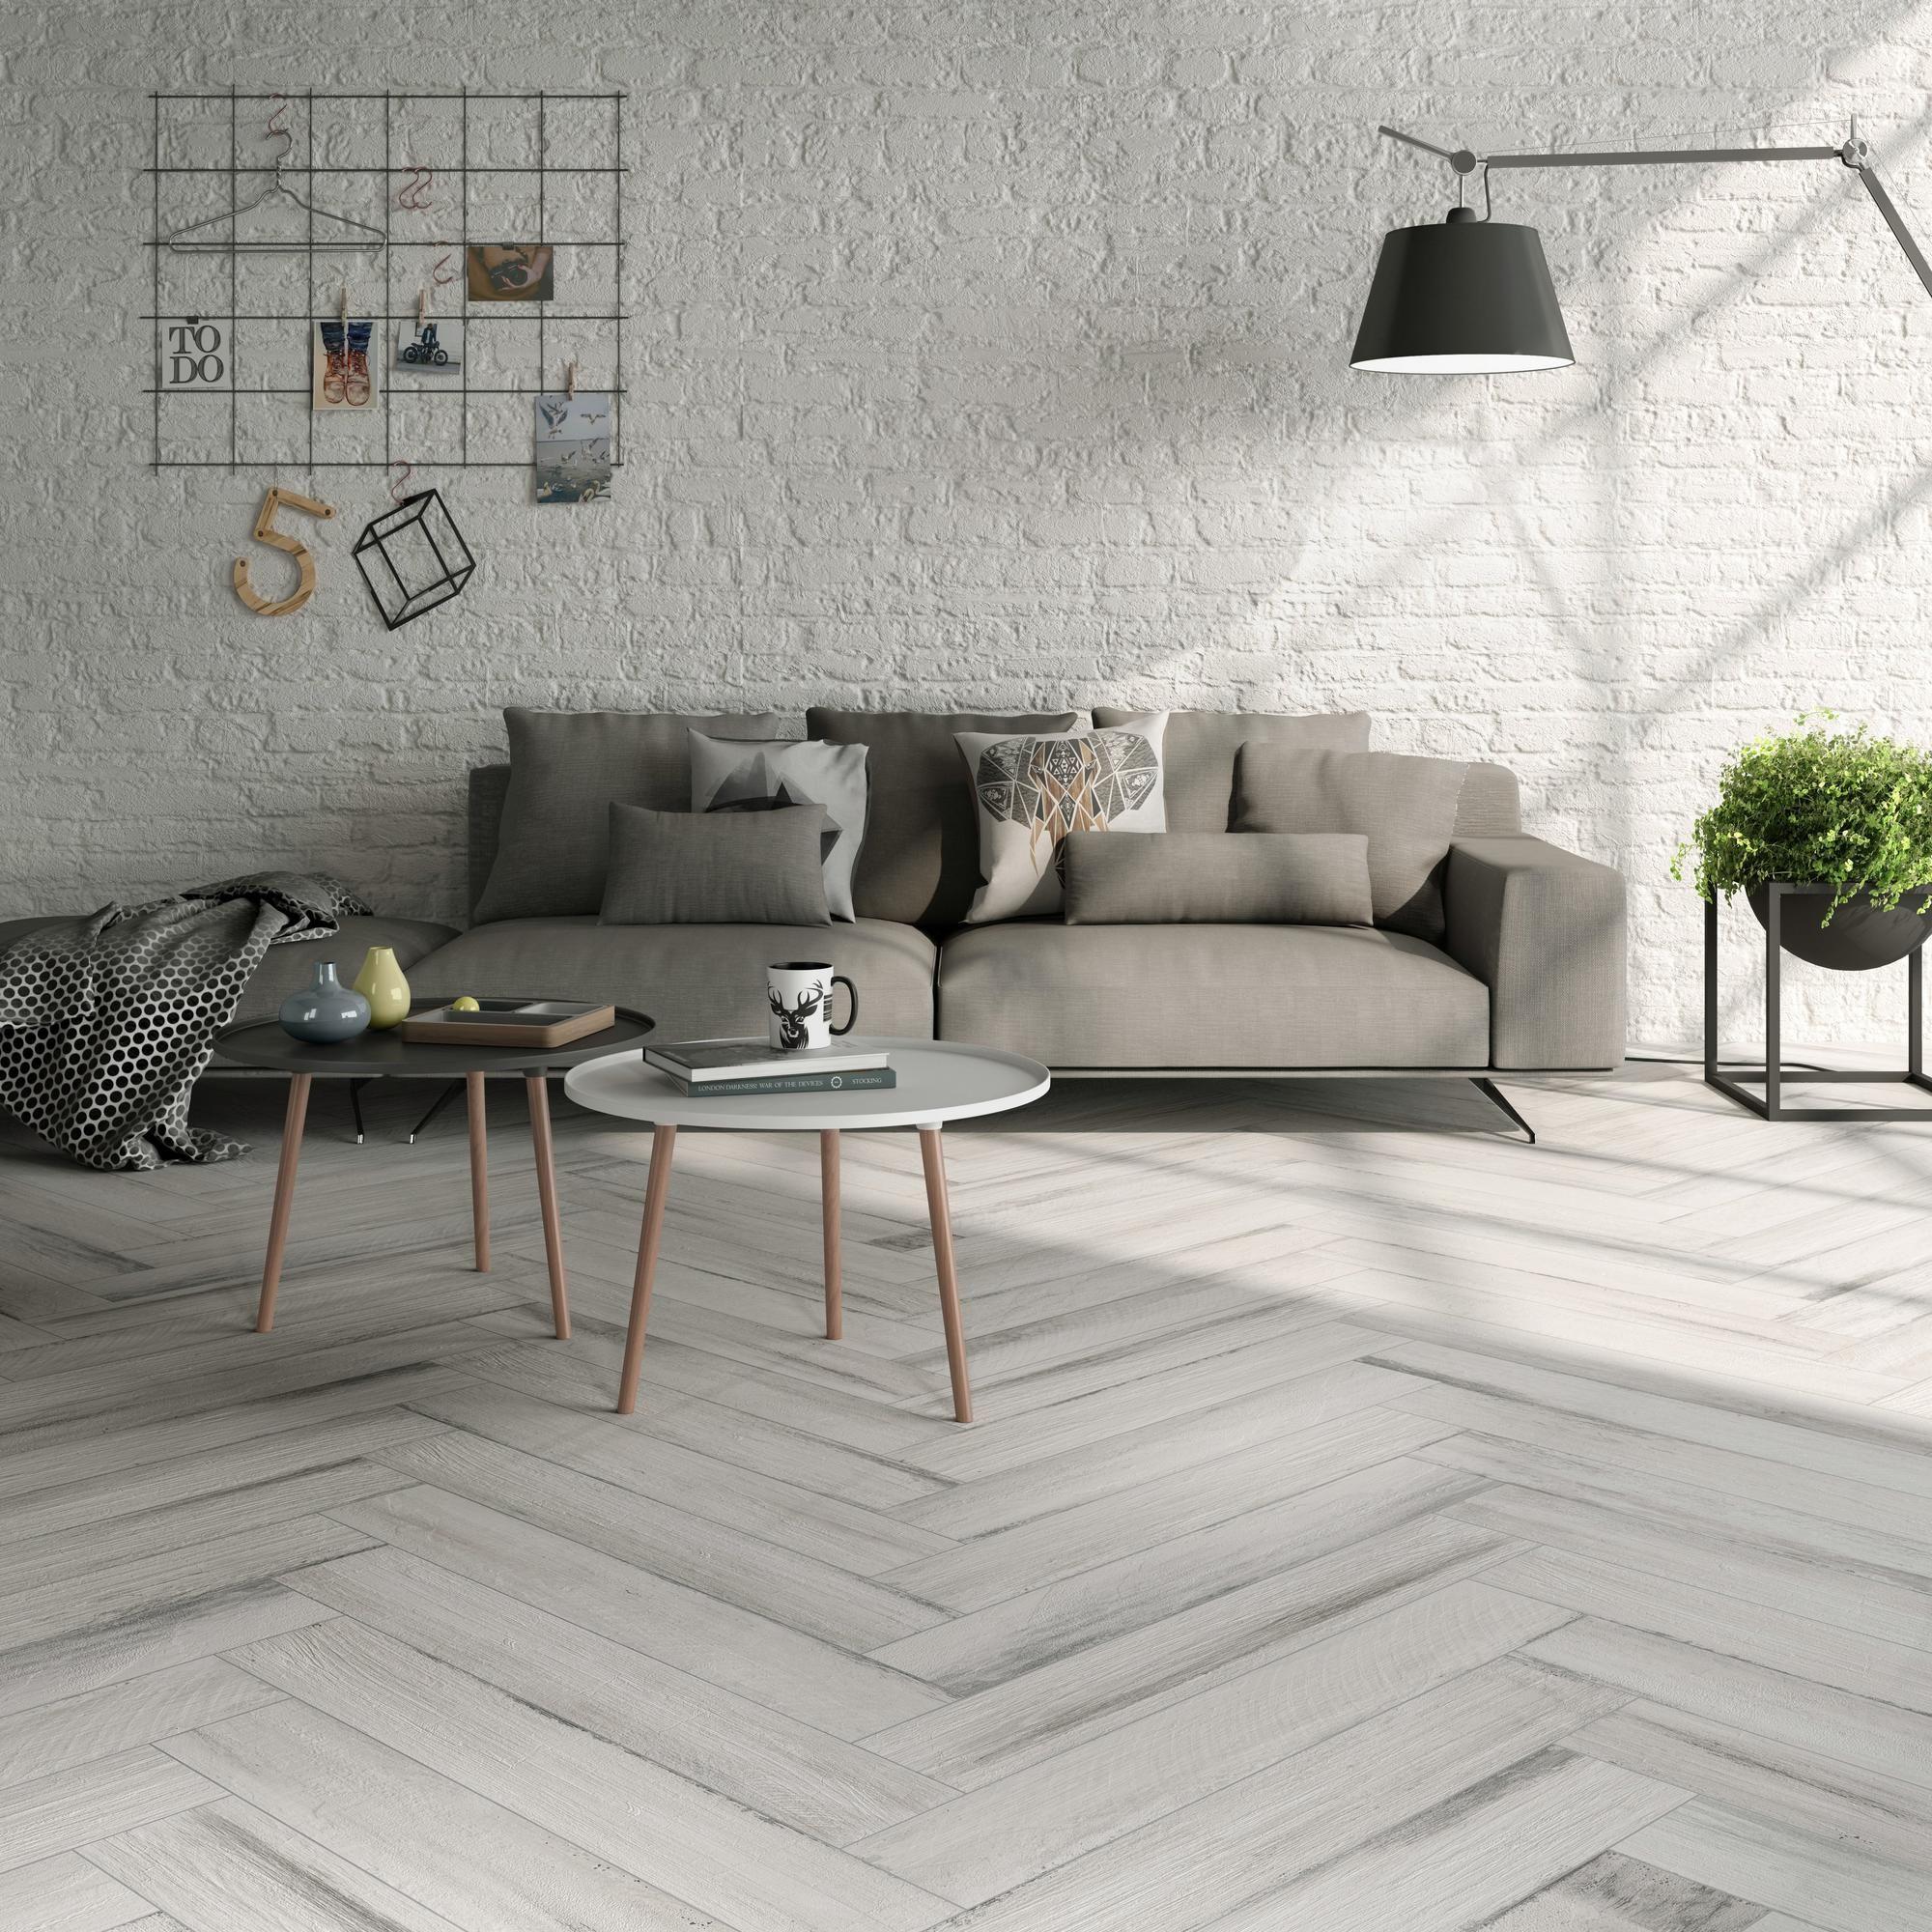 Lexington White Wood Plank Porcelain Tile Floor & Decor